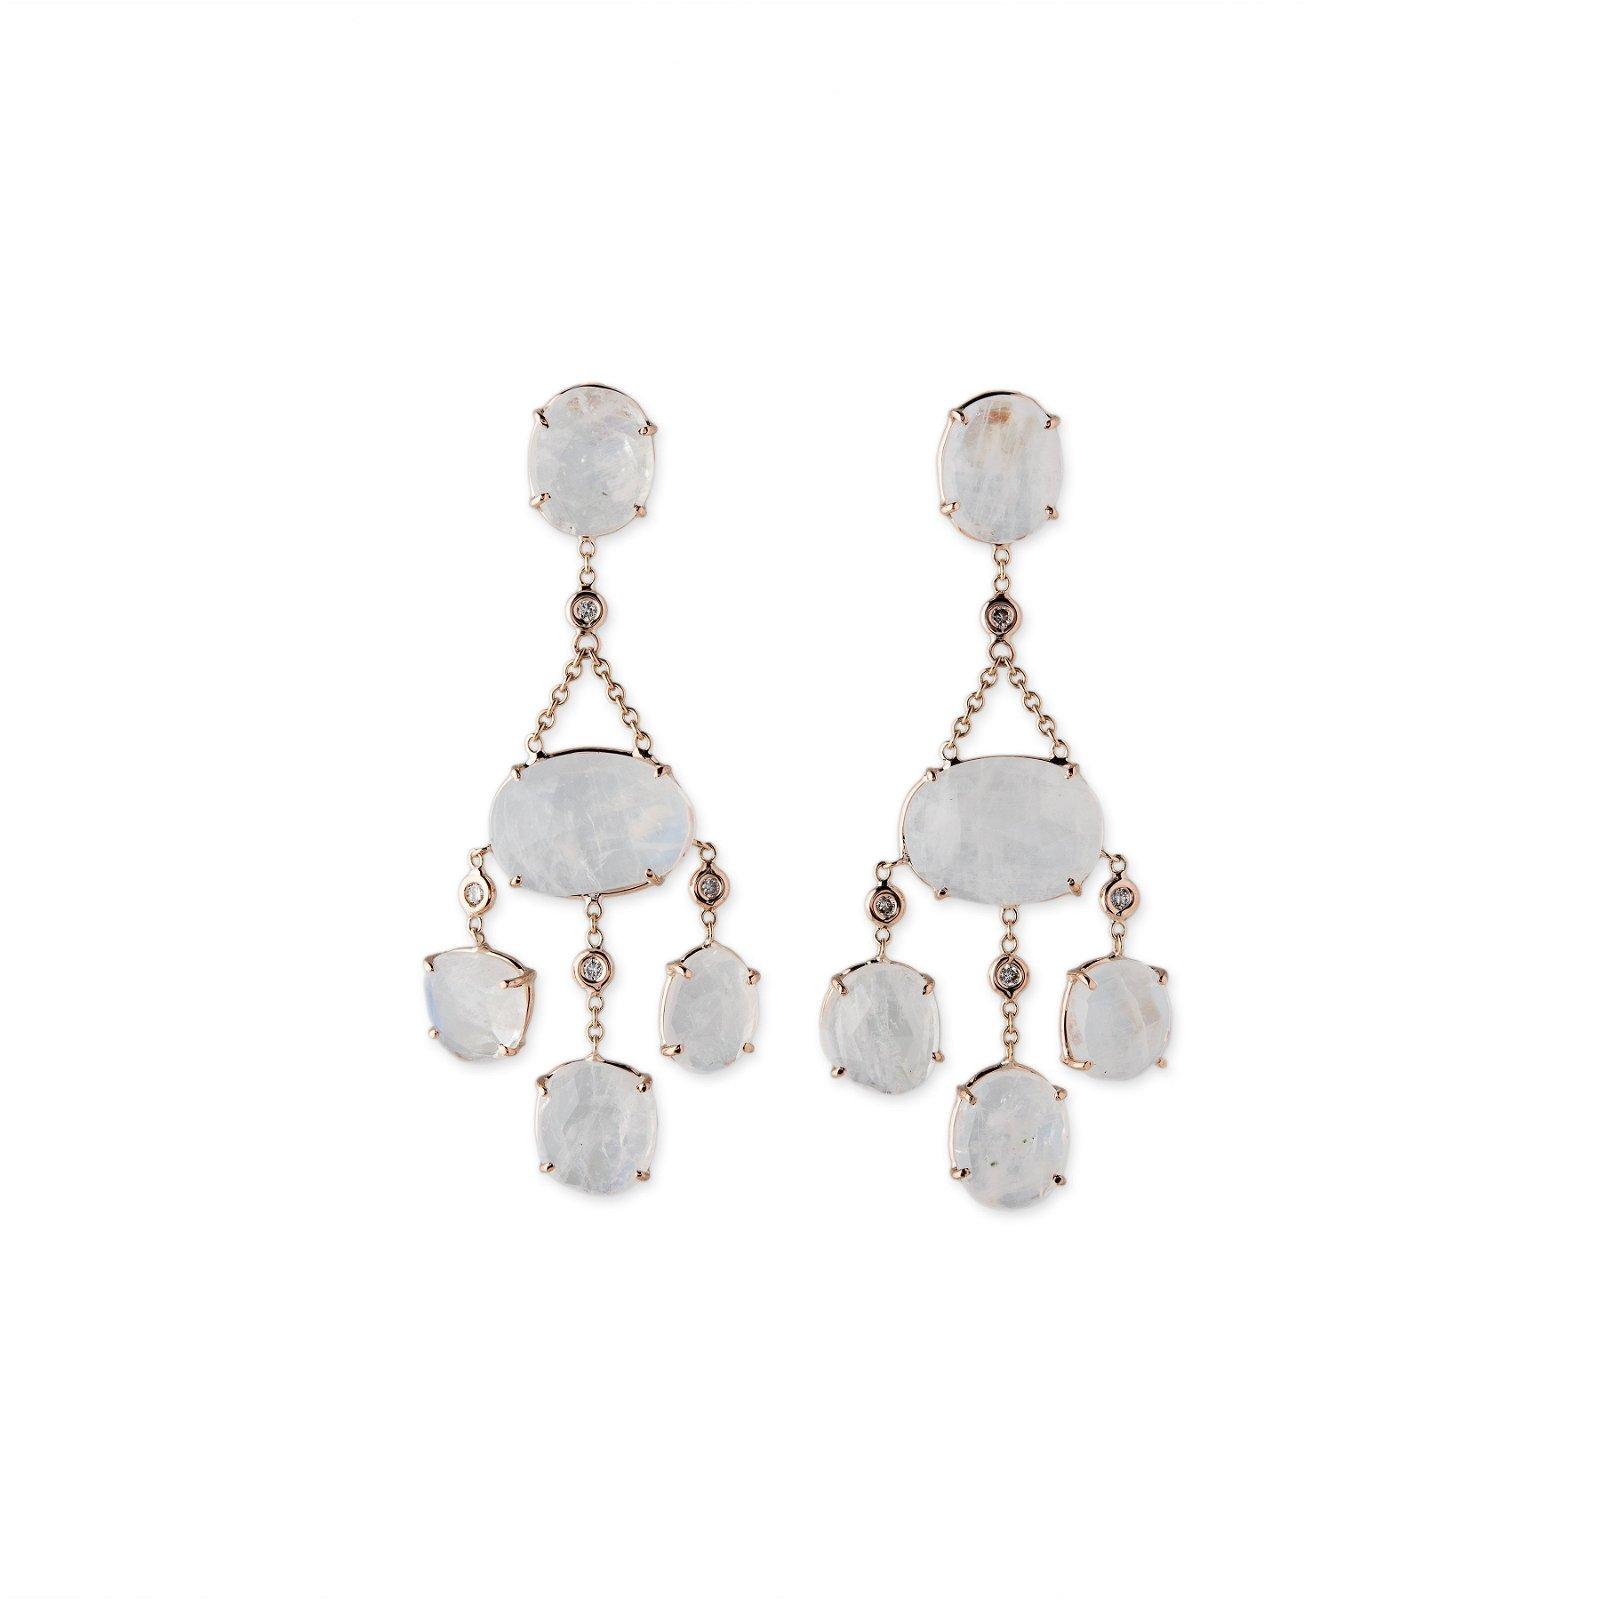 Image of Moonstone and Diamond Drop Earrings